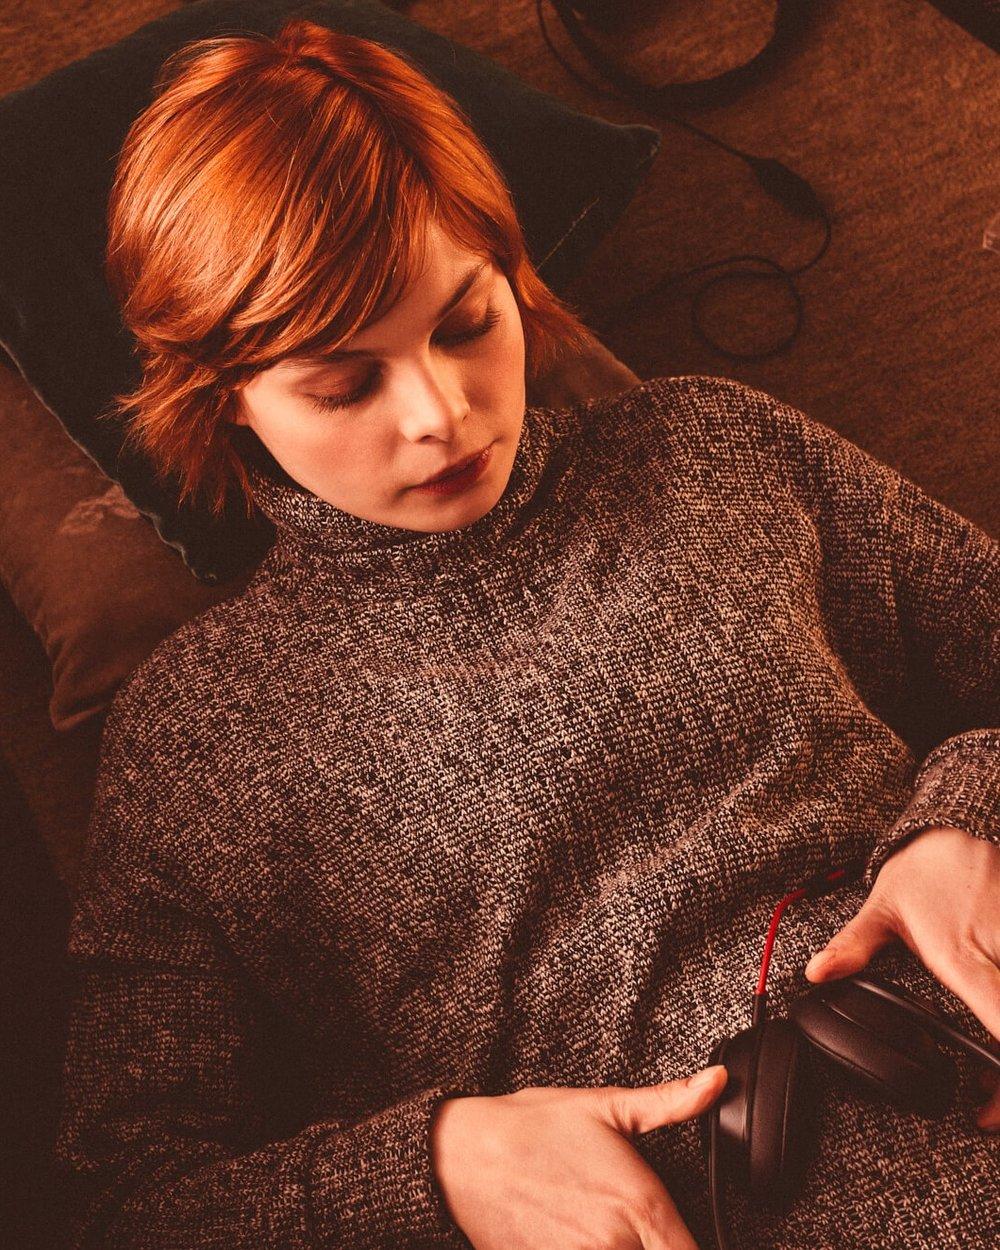 lifestyle photographer Tim Cole shoots girl with beats headphones